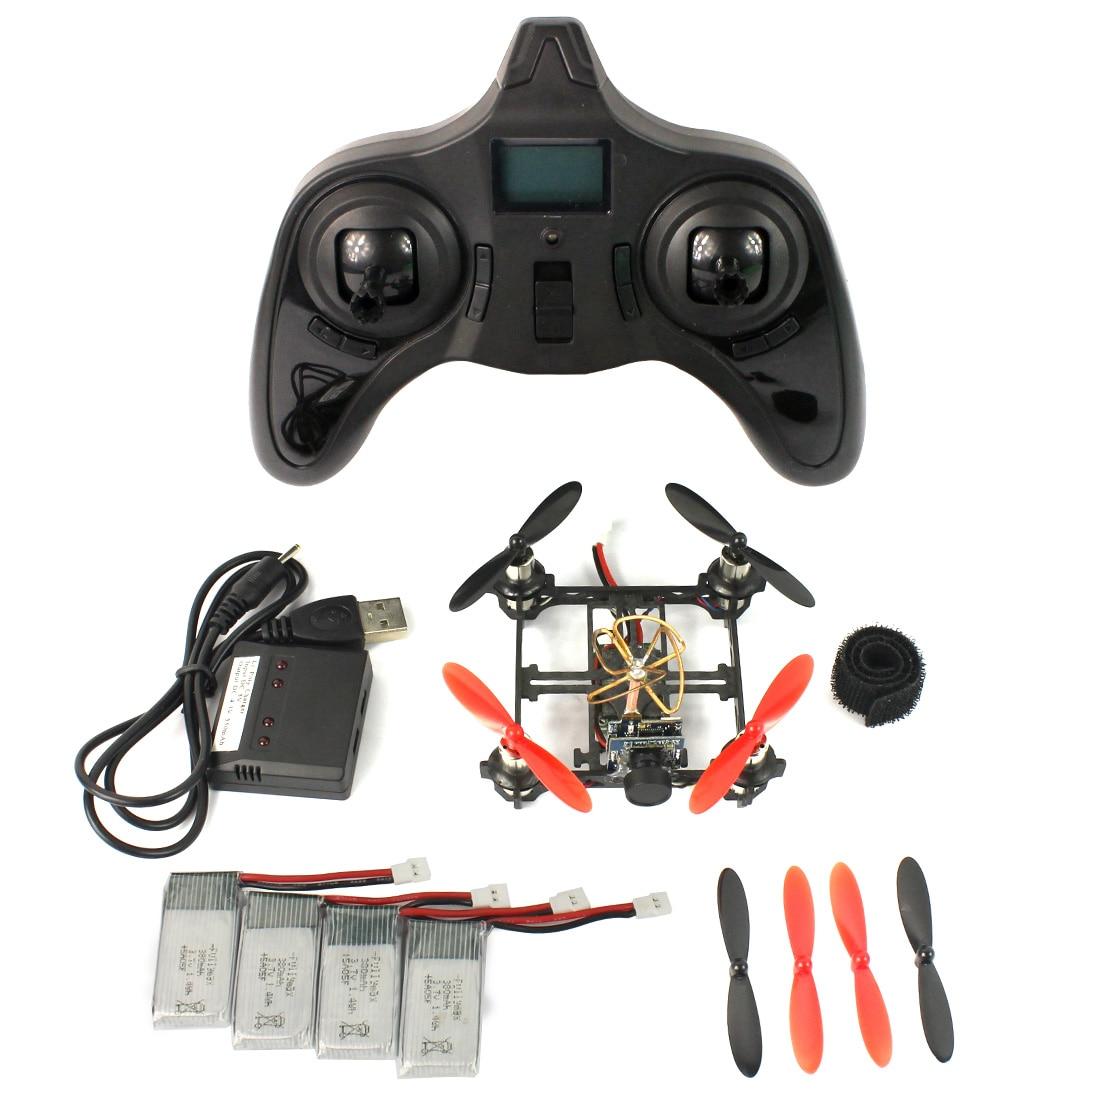 F19032-B/C Mini Tiny QX80 80mm Carbon FPV Brushed Indoor RC Quadcopter DIY RTF Assemble Kit H107 Flight Control 5.8G 25mW Camera<br><br>Aliexpress